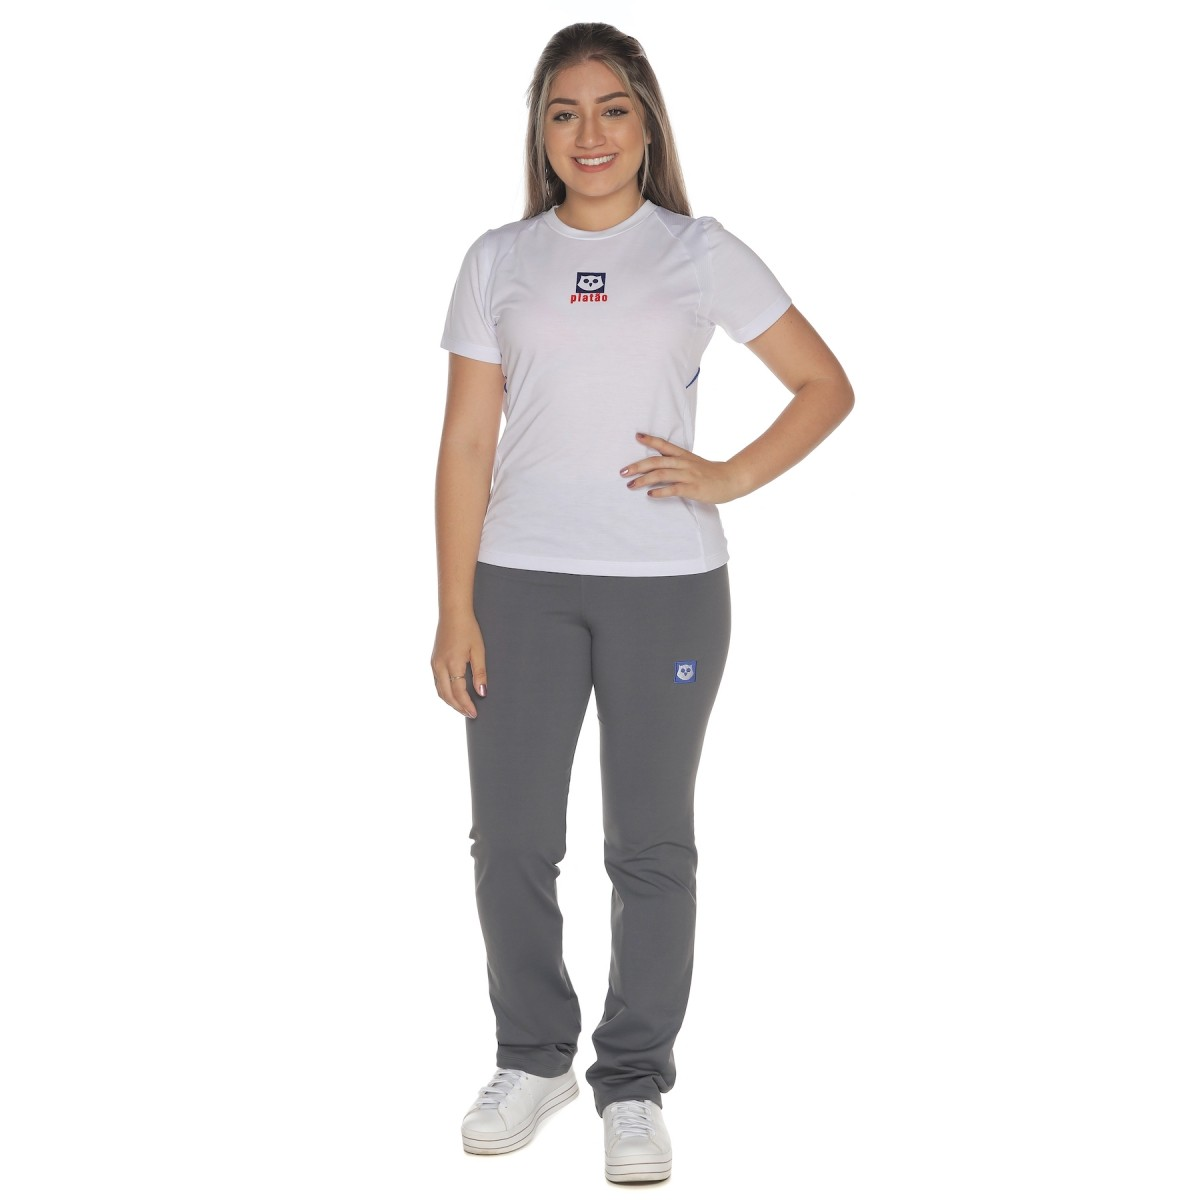 Camiseta Baby Look Malha PV - Colégio Platão